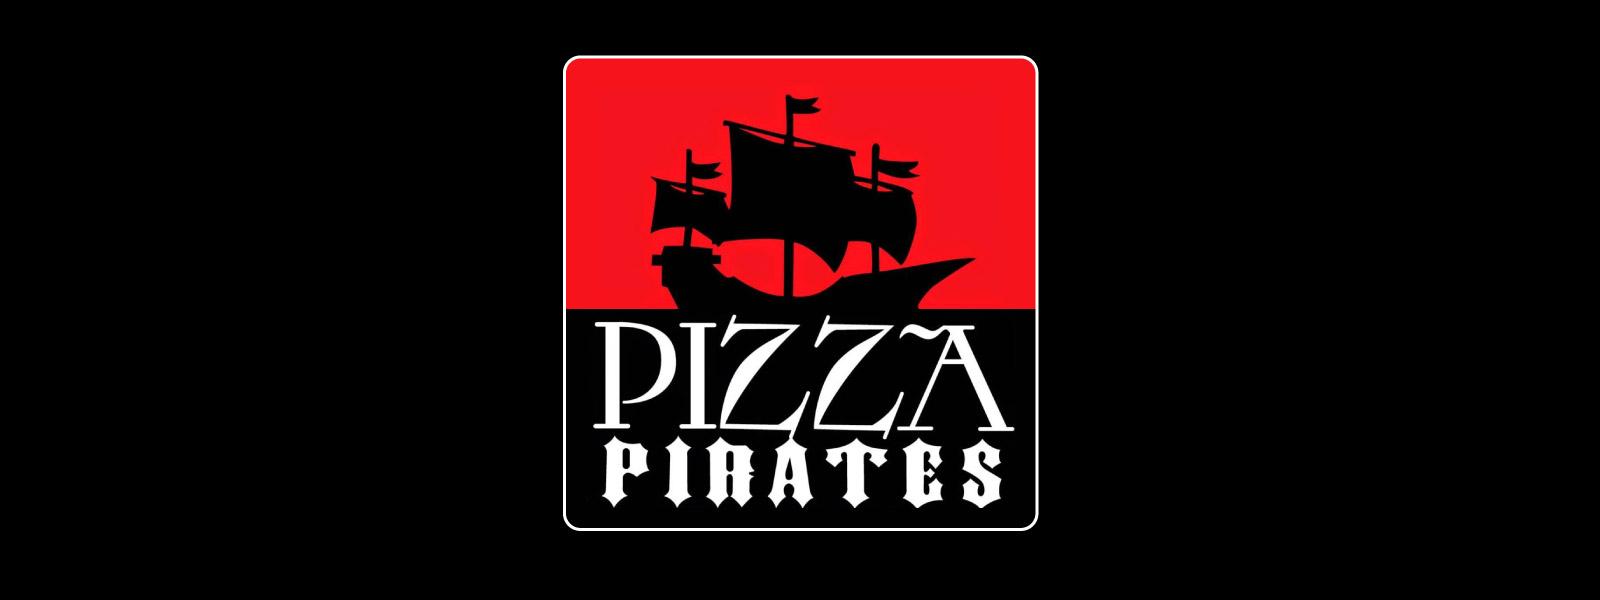 Pizza-Pirates-header